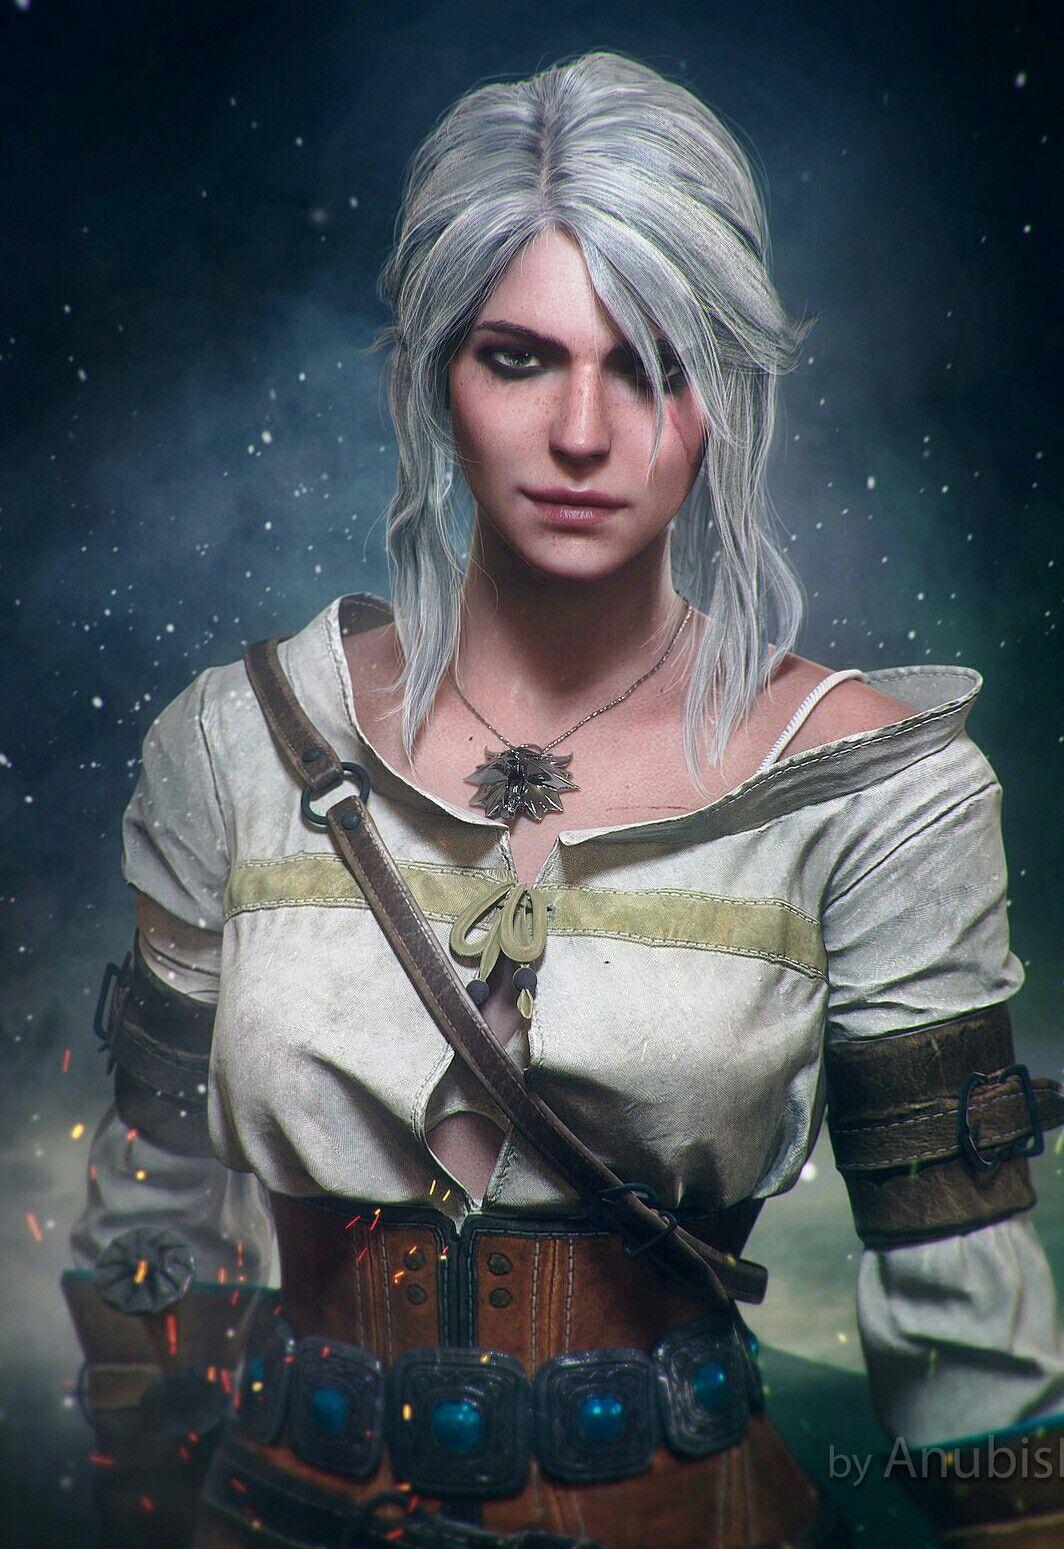 Ciri the witcher